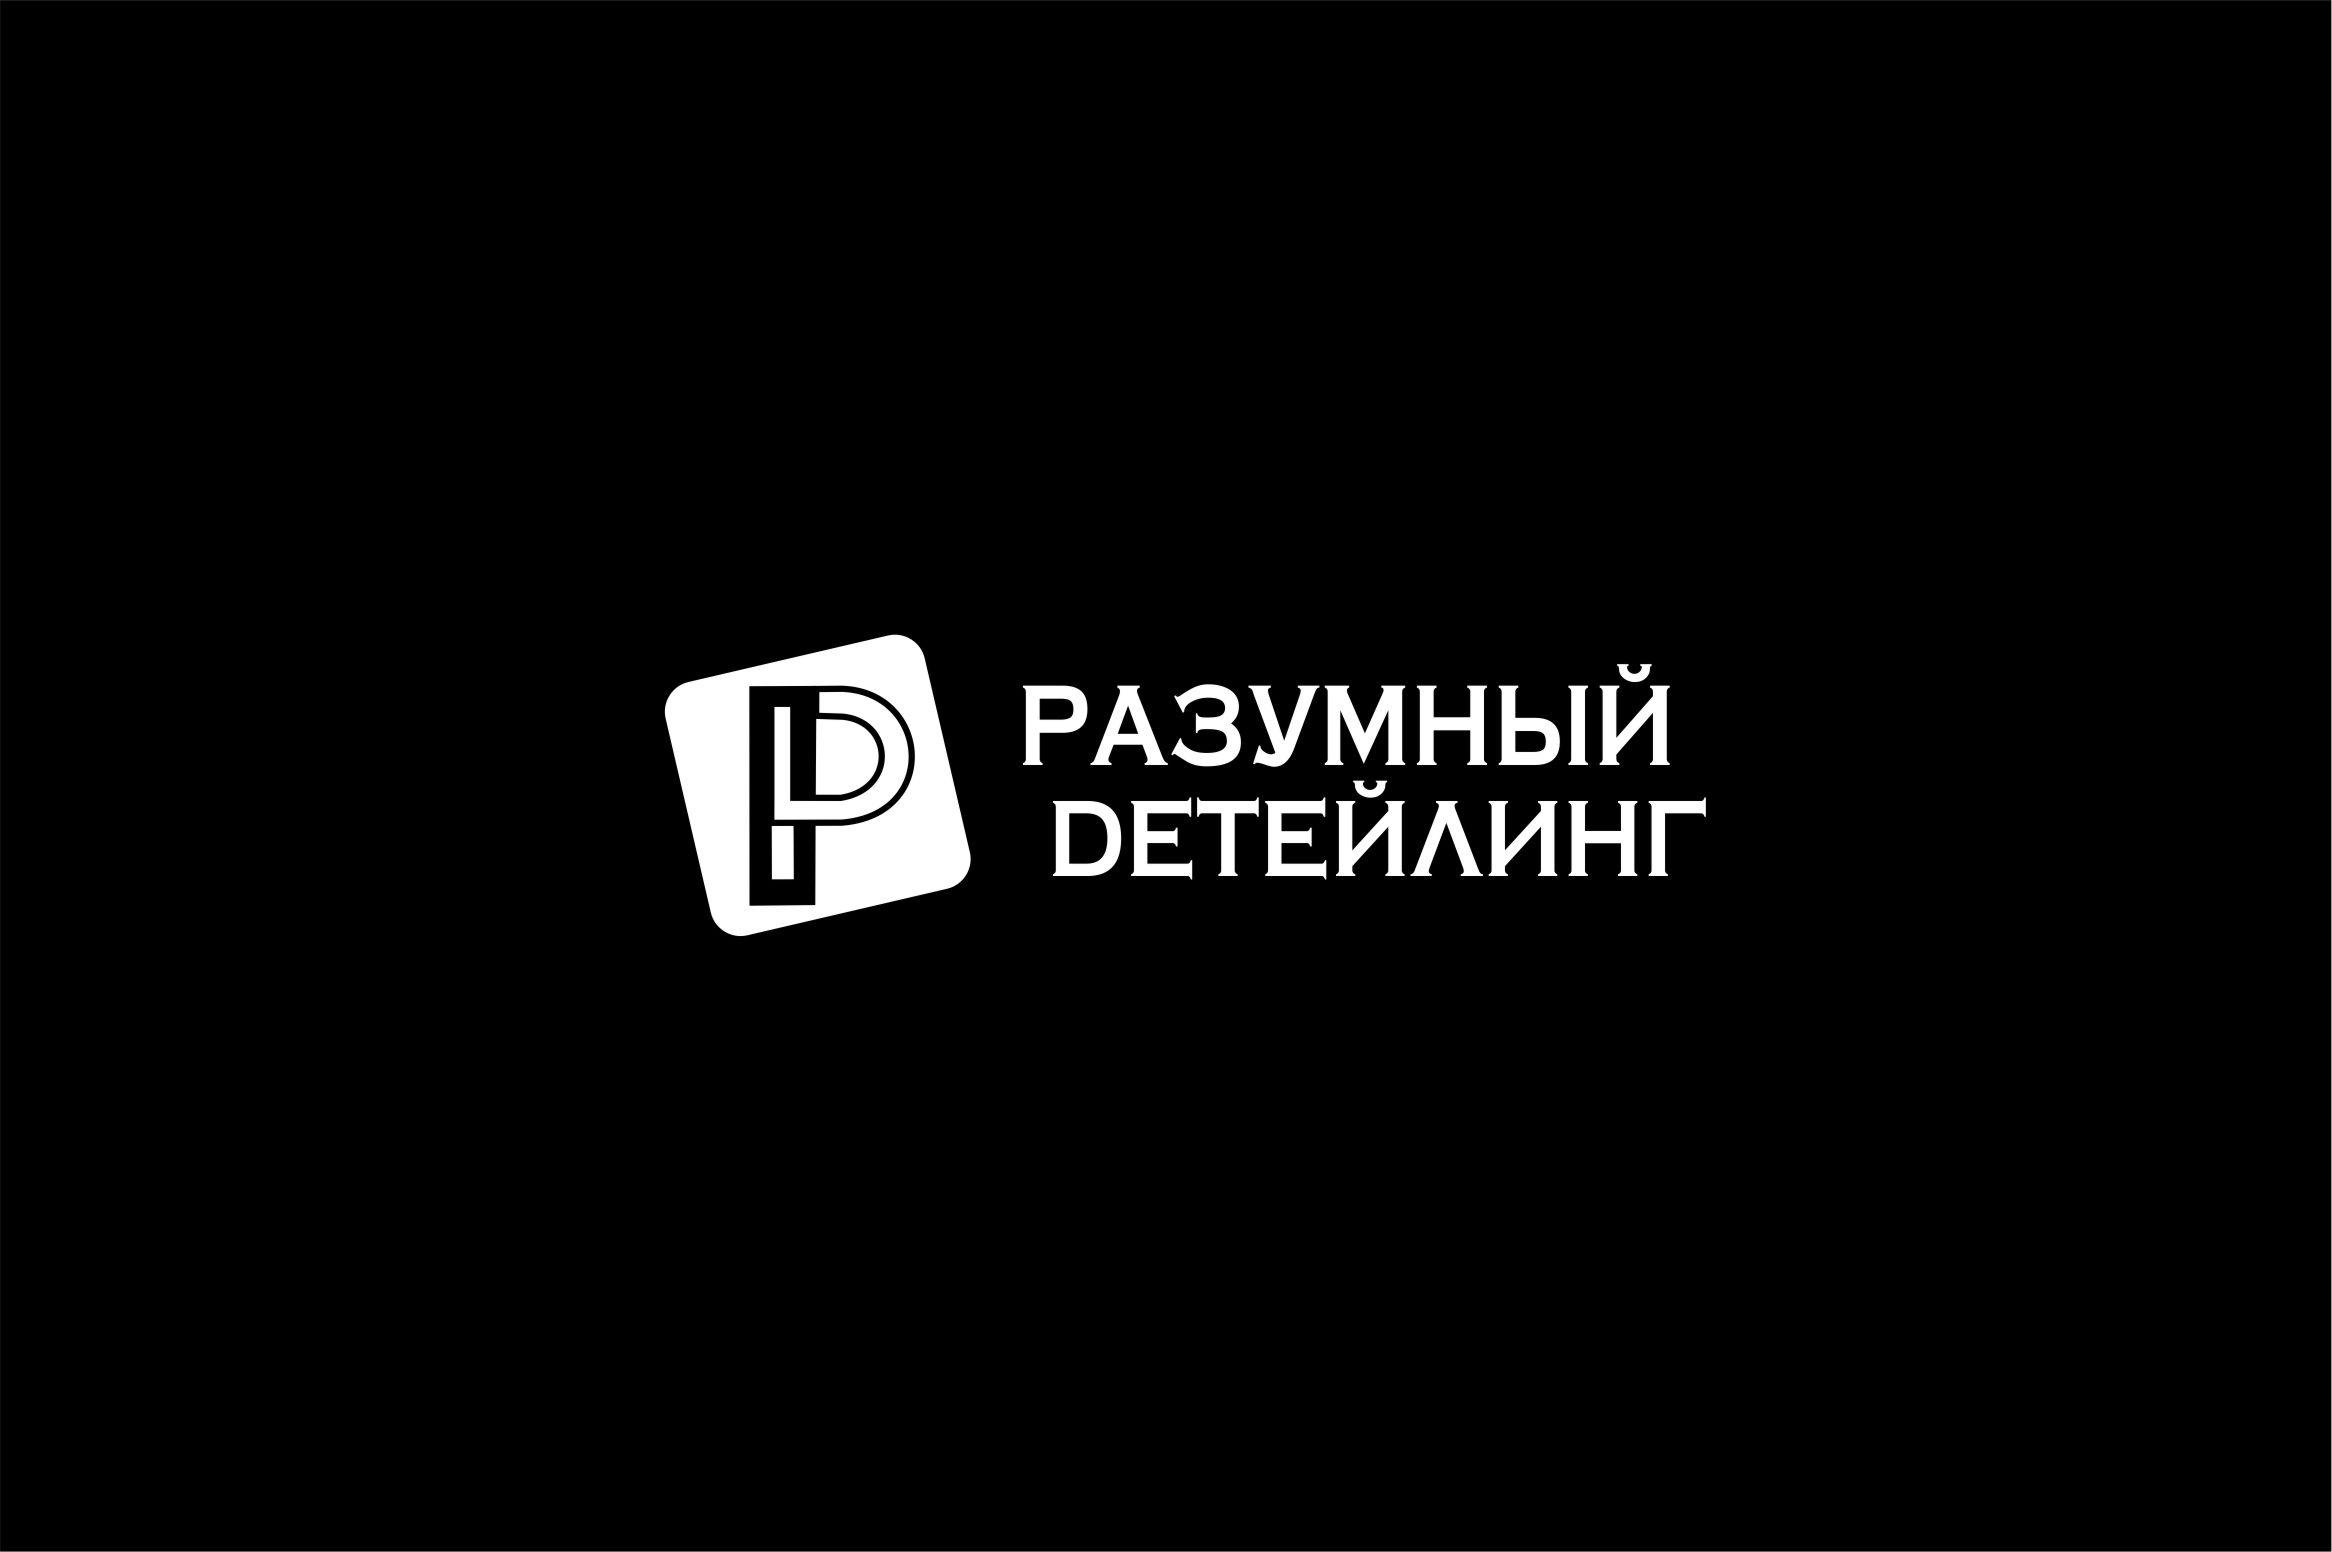 Ребрендинг логотипа  фото f_9755ae31c1c01d15.jpg